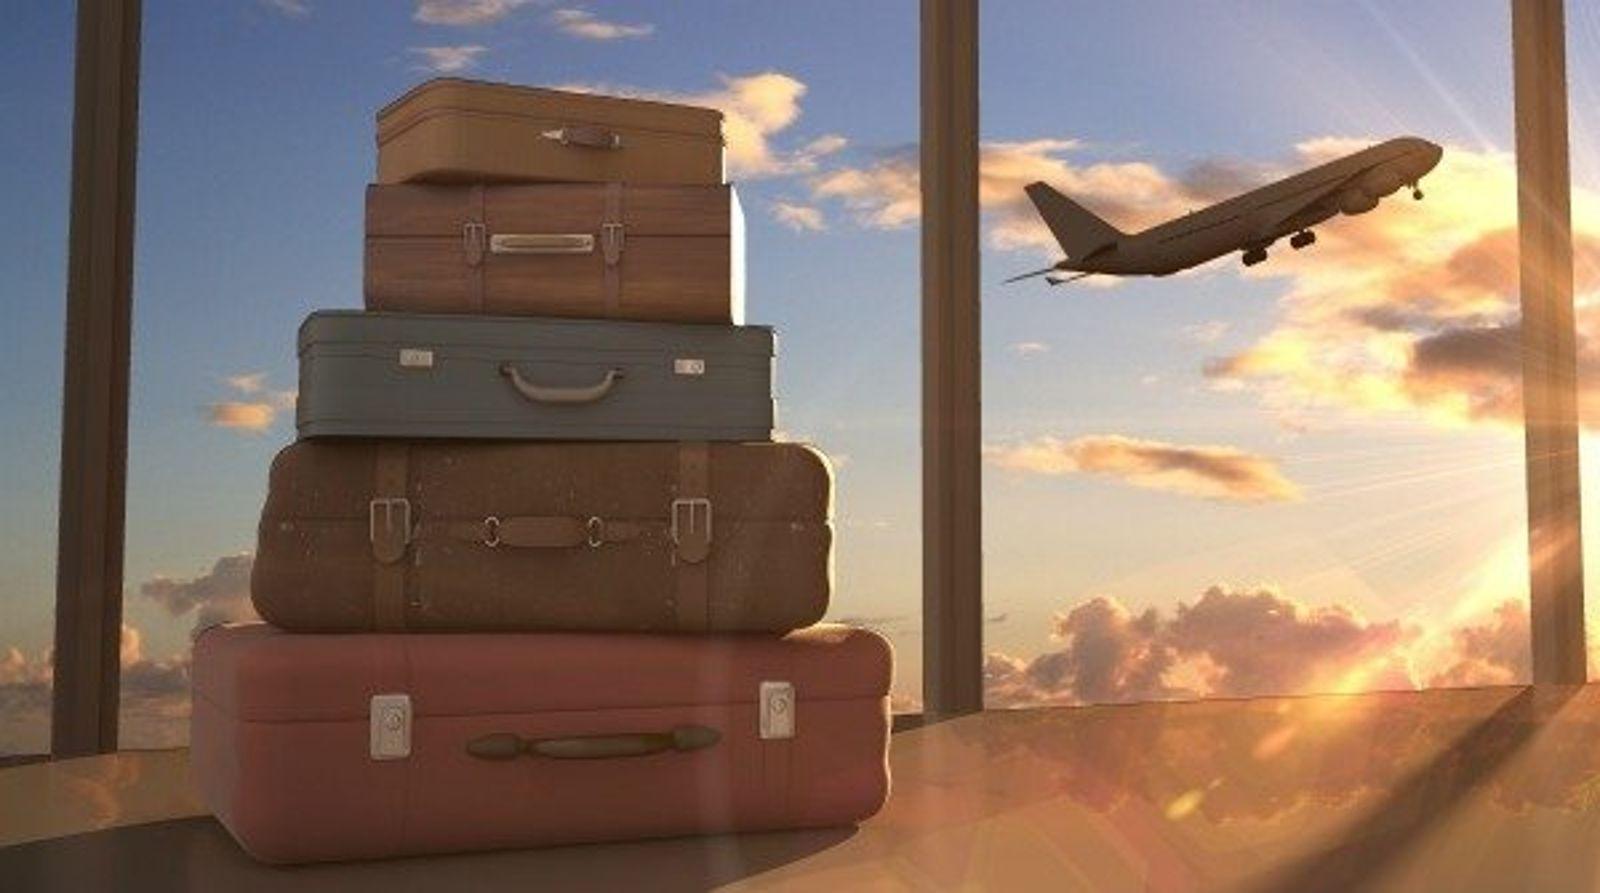 Solo necesita 9 pasos para viajar por el mundo: viajar, viajar